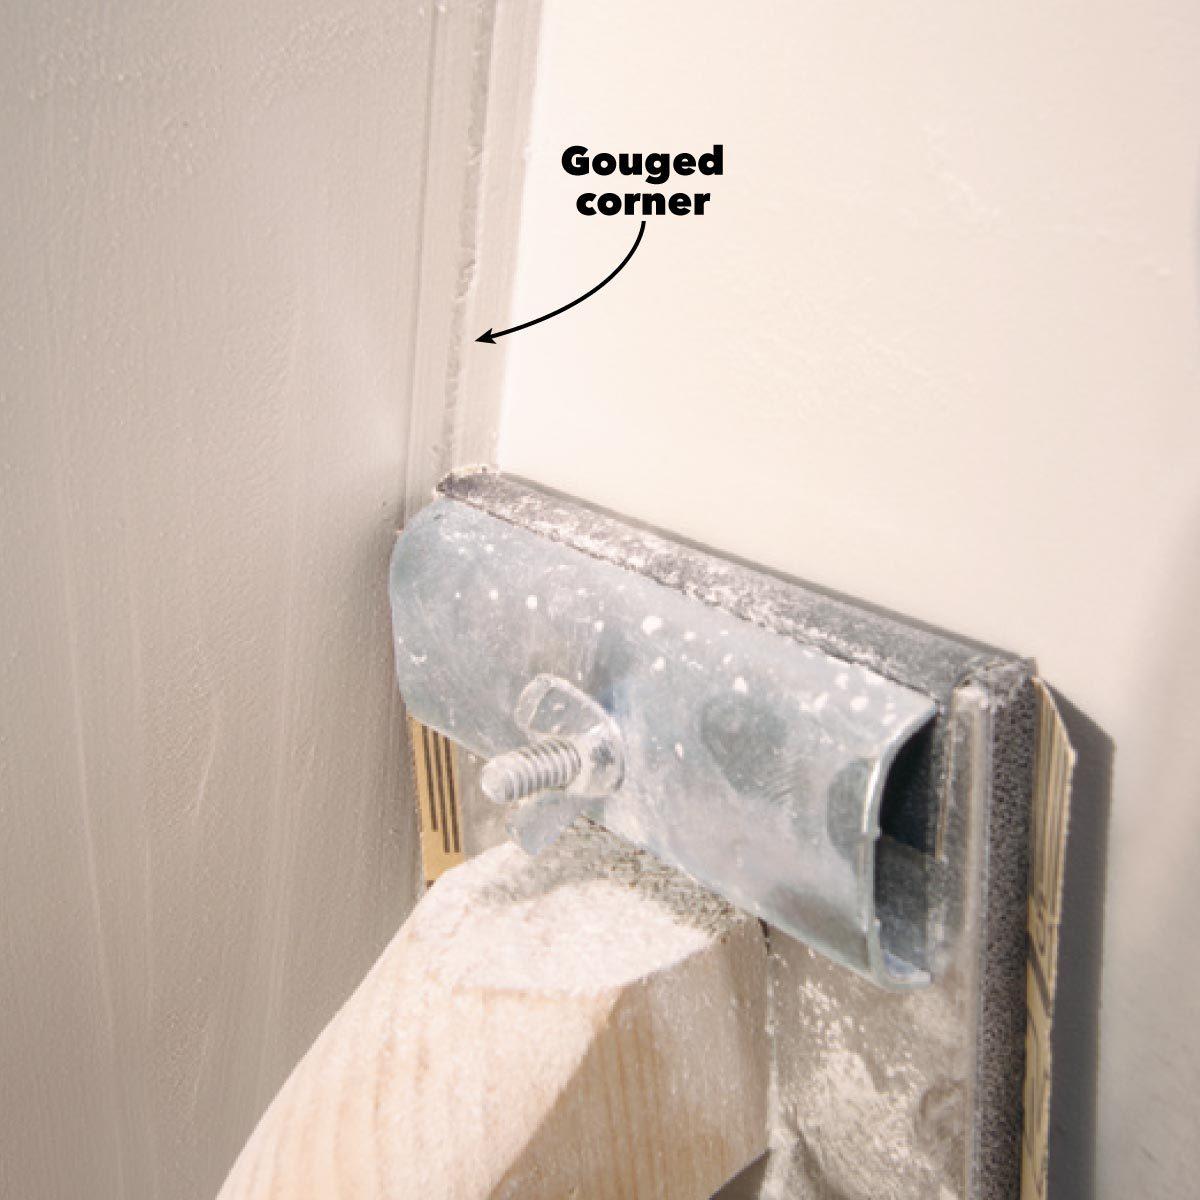 drywall sanding gouged corners